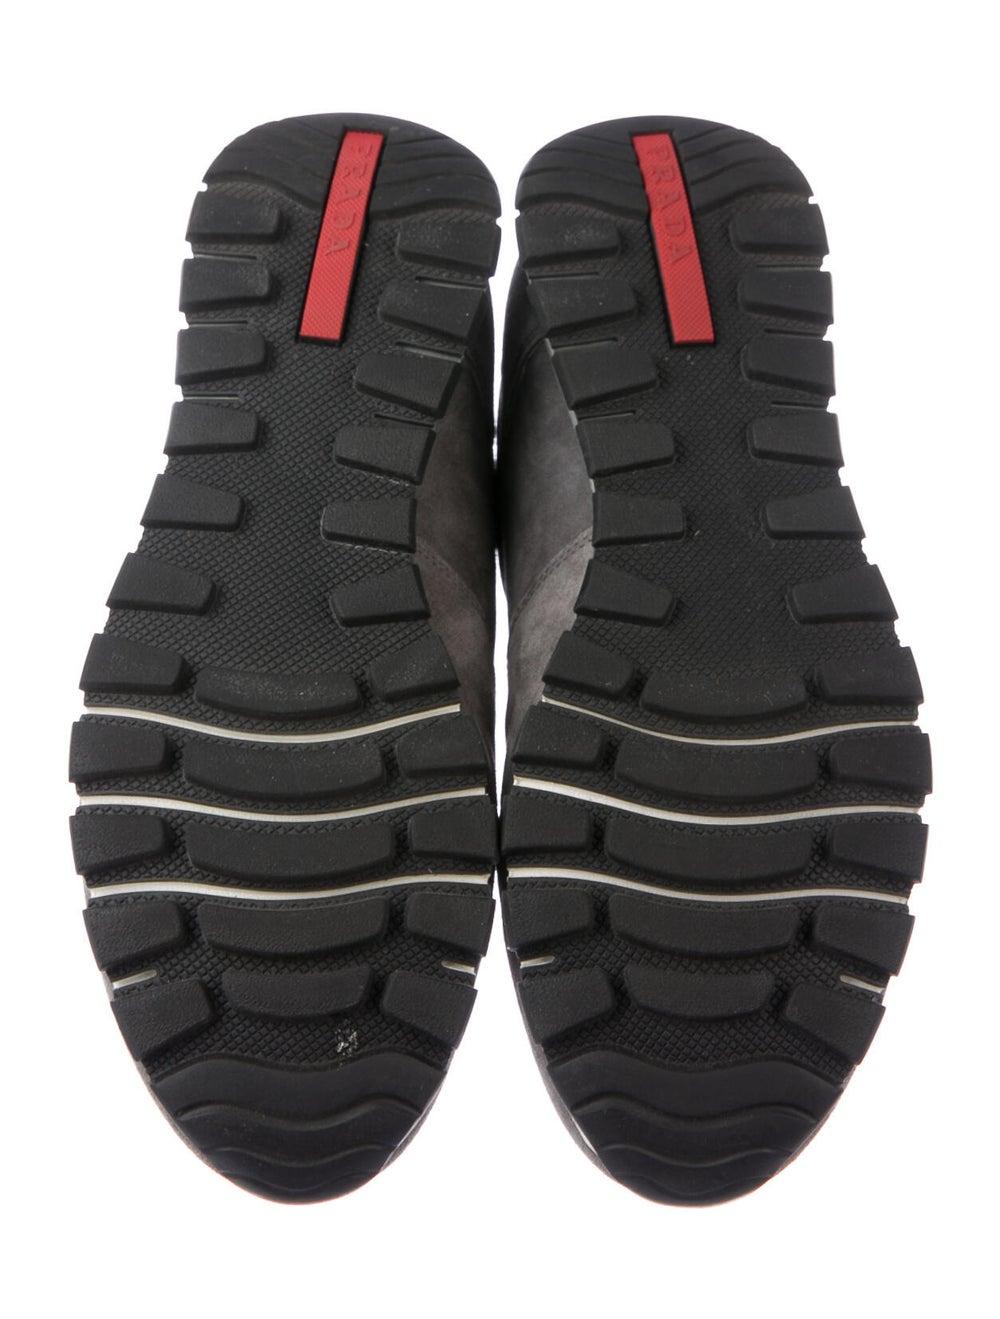 Prada Sport Suede Sneakers Grey - image 5